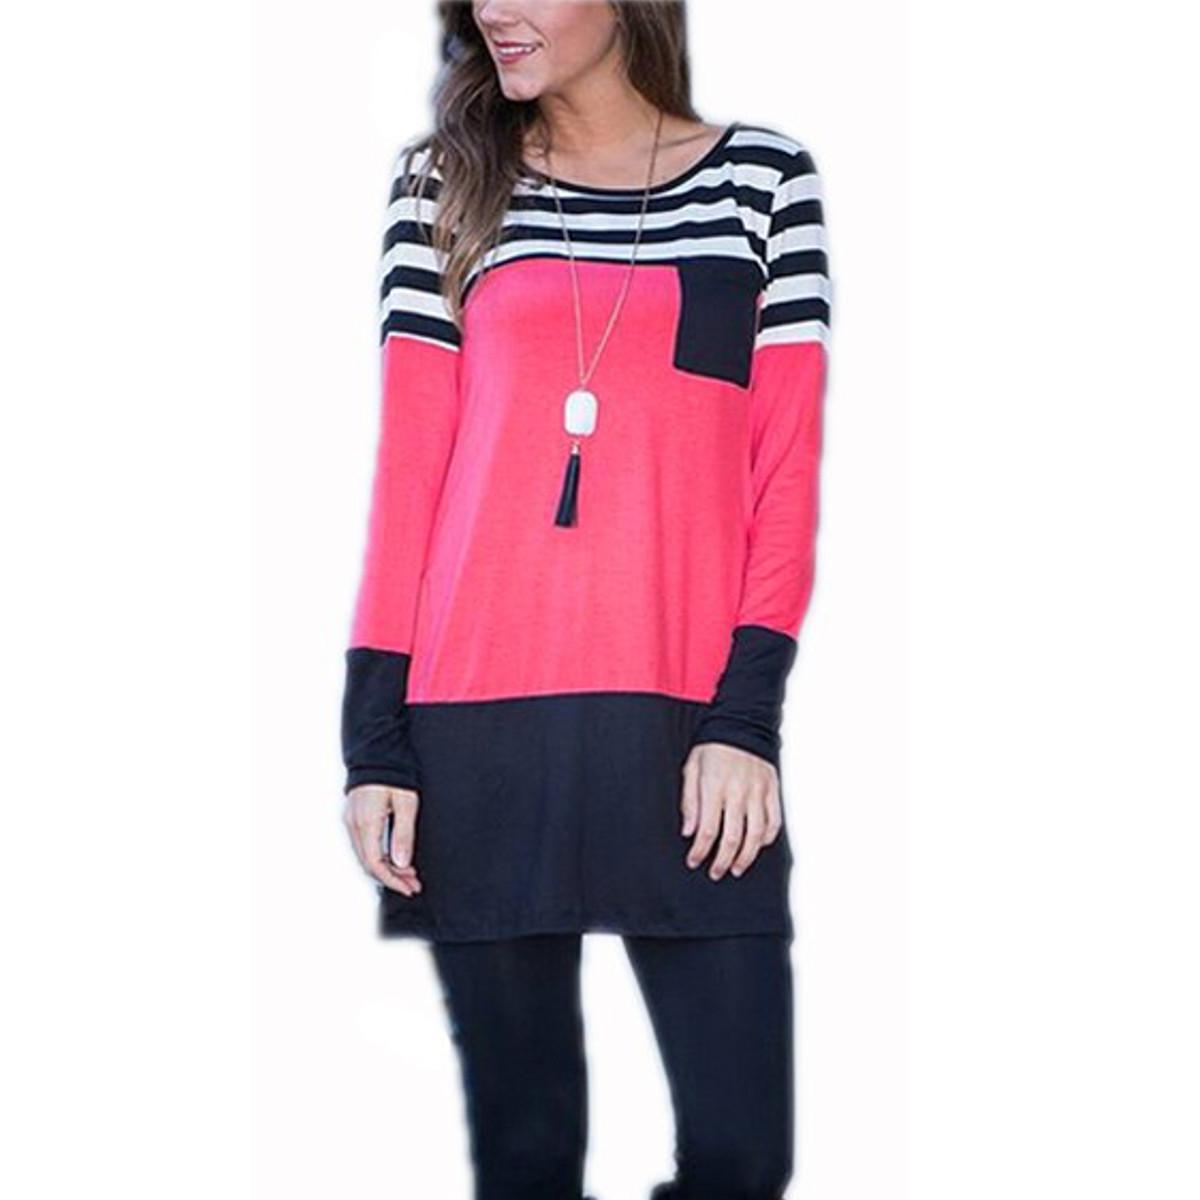 Shirt new design 2015 - Fashion Women Loose Full Sleeve T Shirt Autumn Cotton Long T Shirts Tops 2015 New